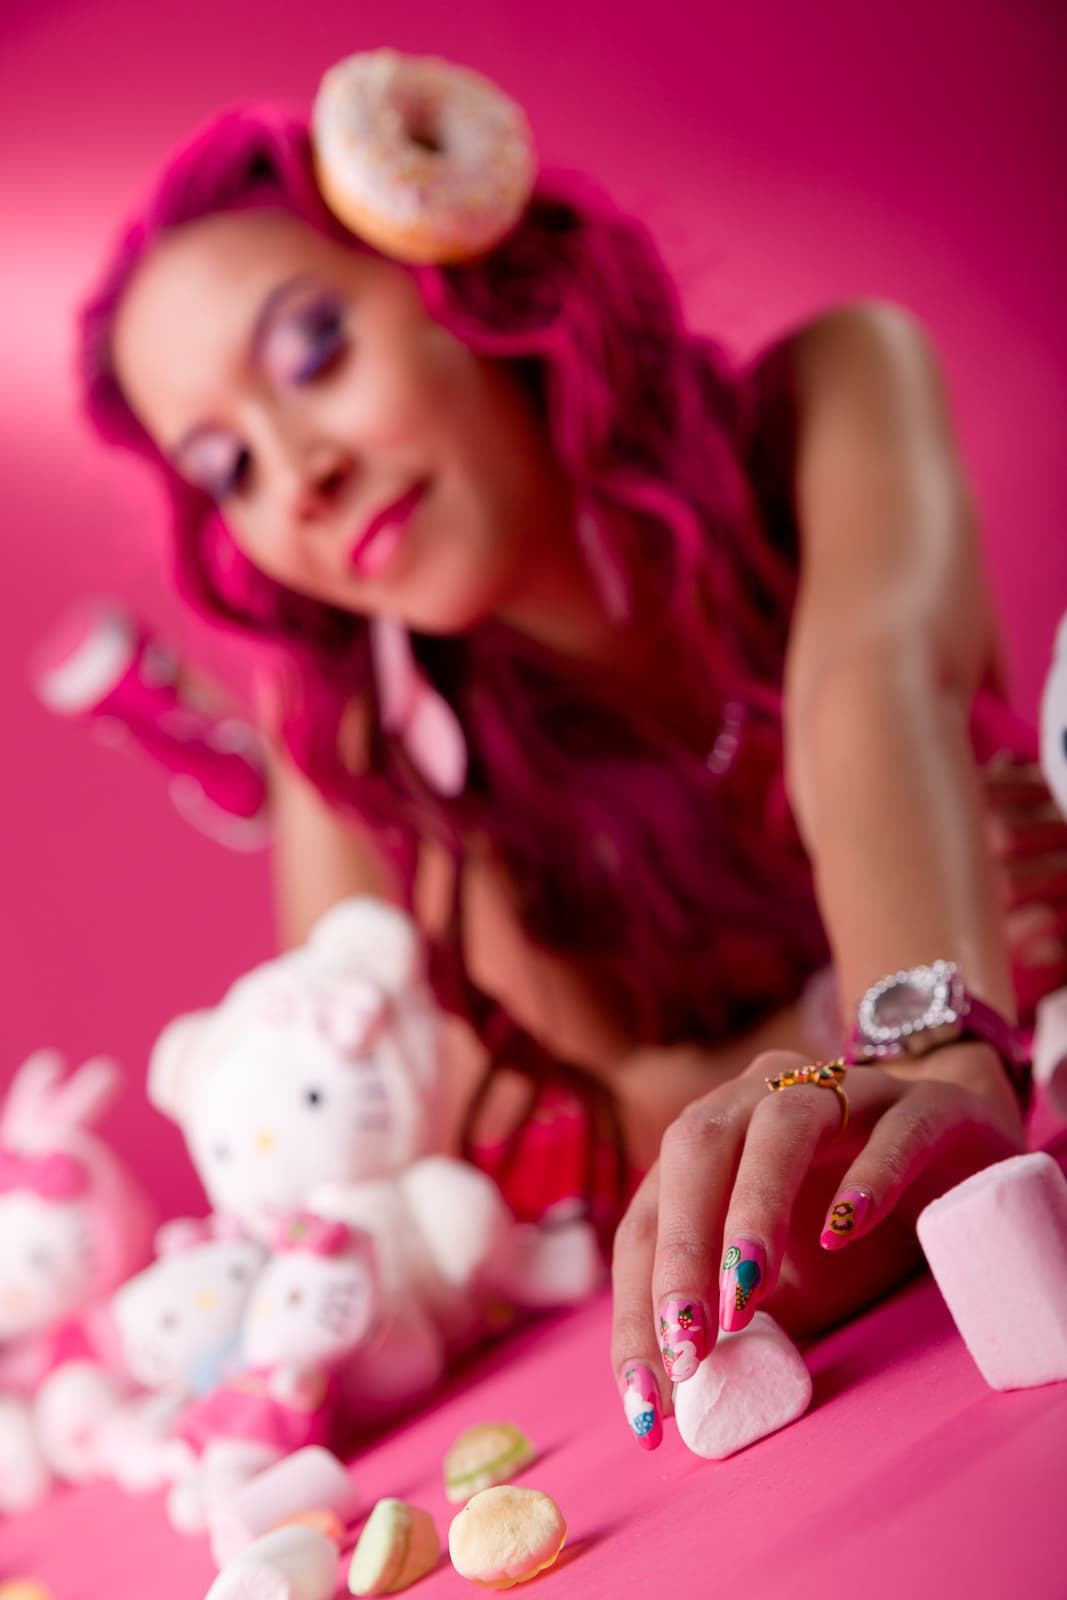 jenny suv femme genève modèle mannequin suisse maquilleuse danseuse nu charme rose